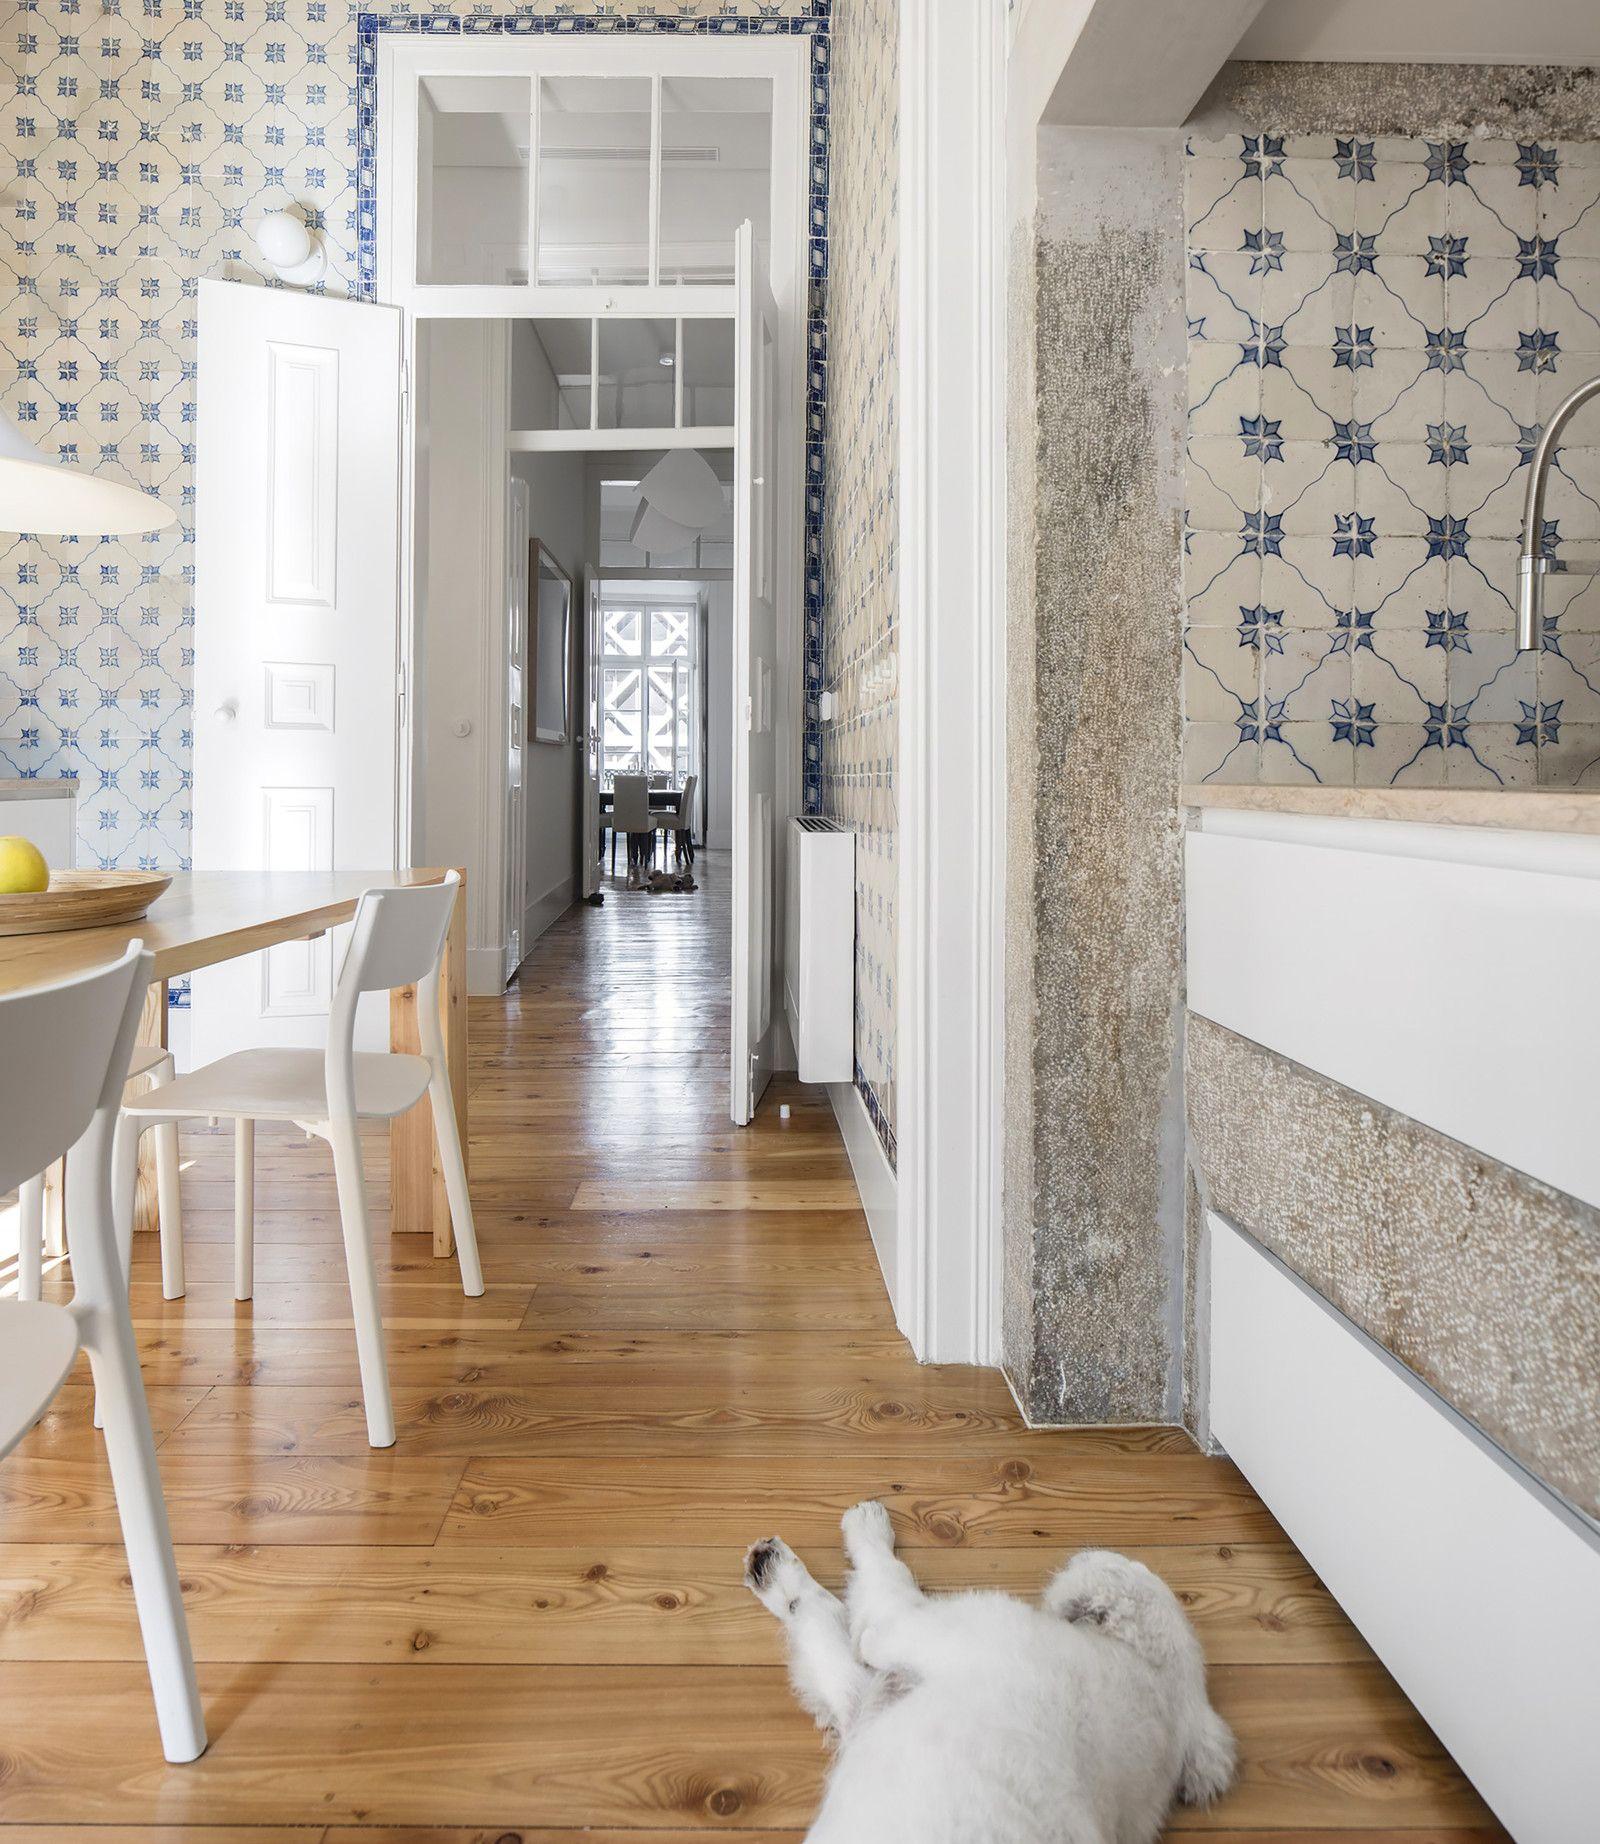 Azulejos Legno E Bianco Pinterest Decoration Room And Spaces